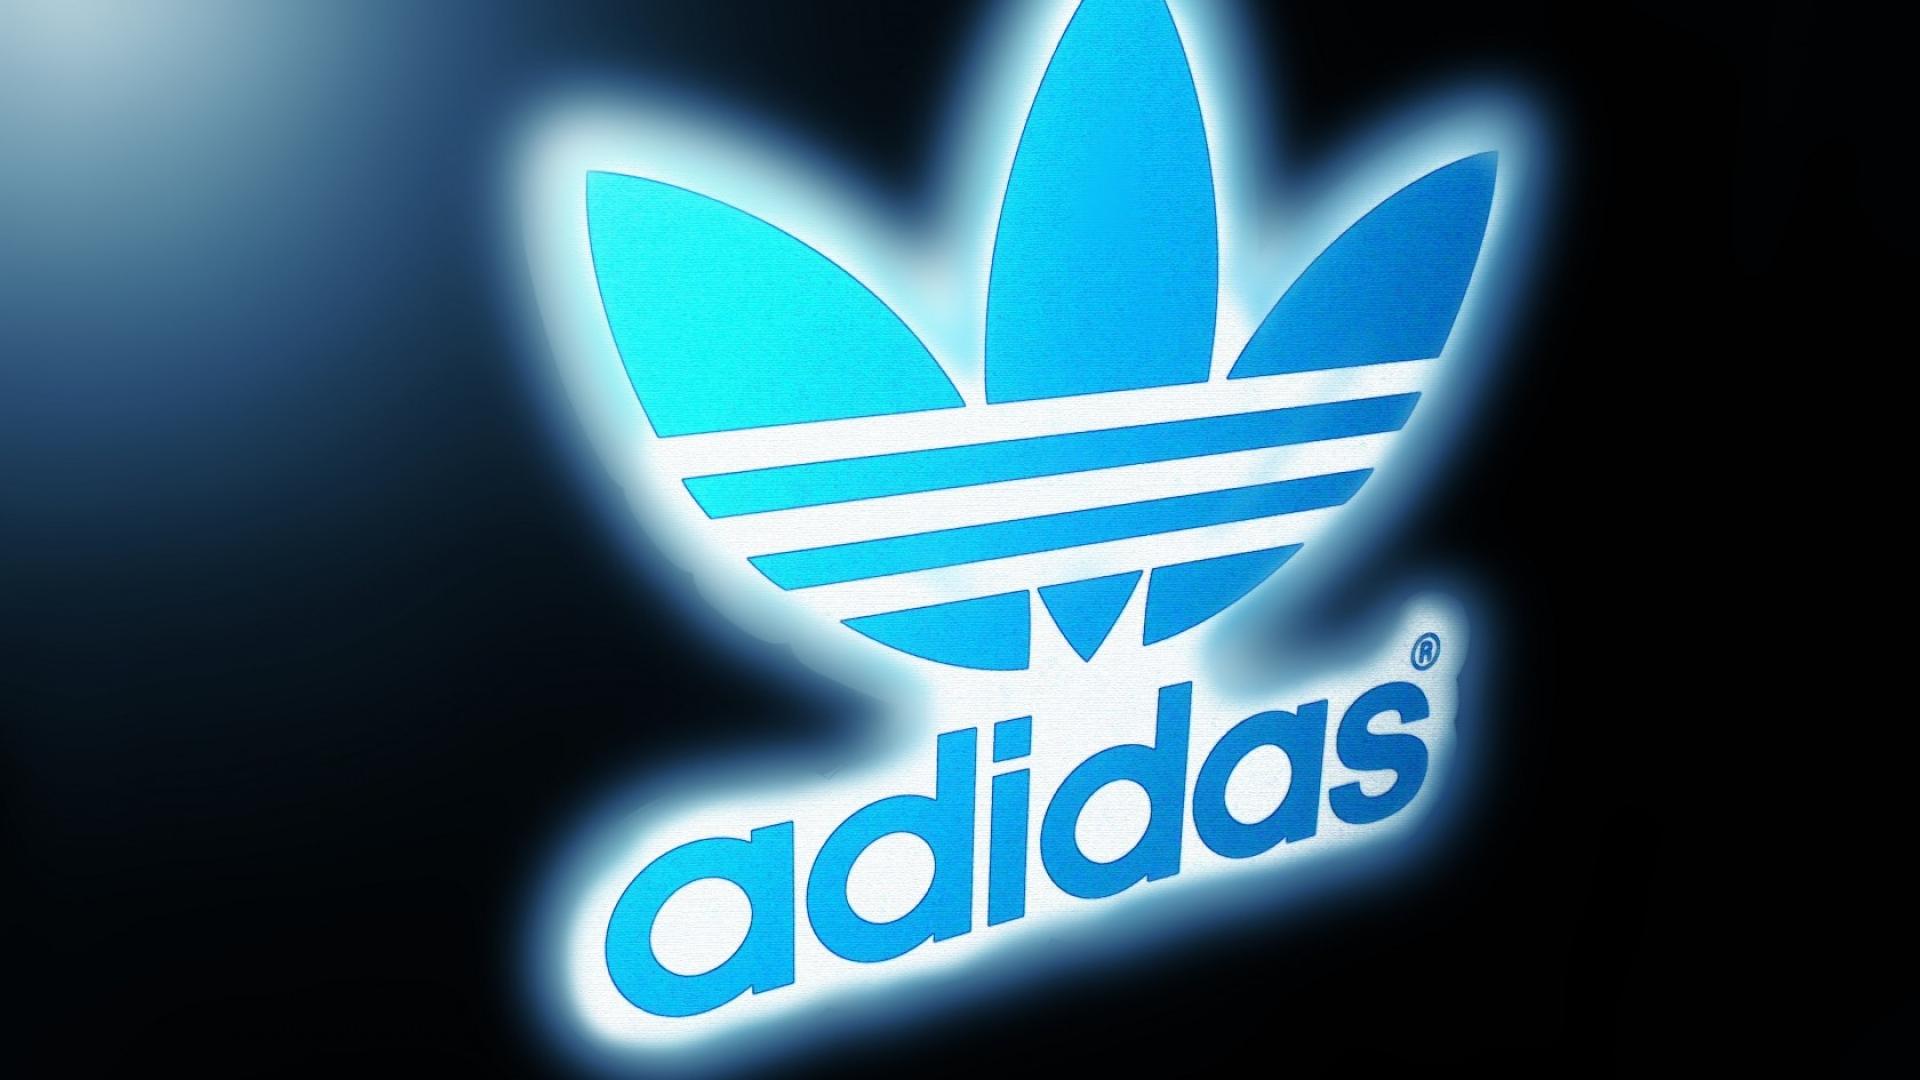 Adidas Live Wallpaper Free 1.7.4 на андроид скачать | 1080x1920